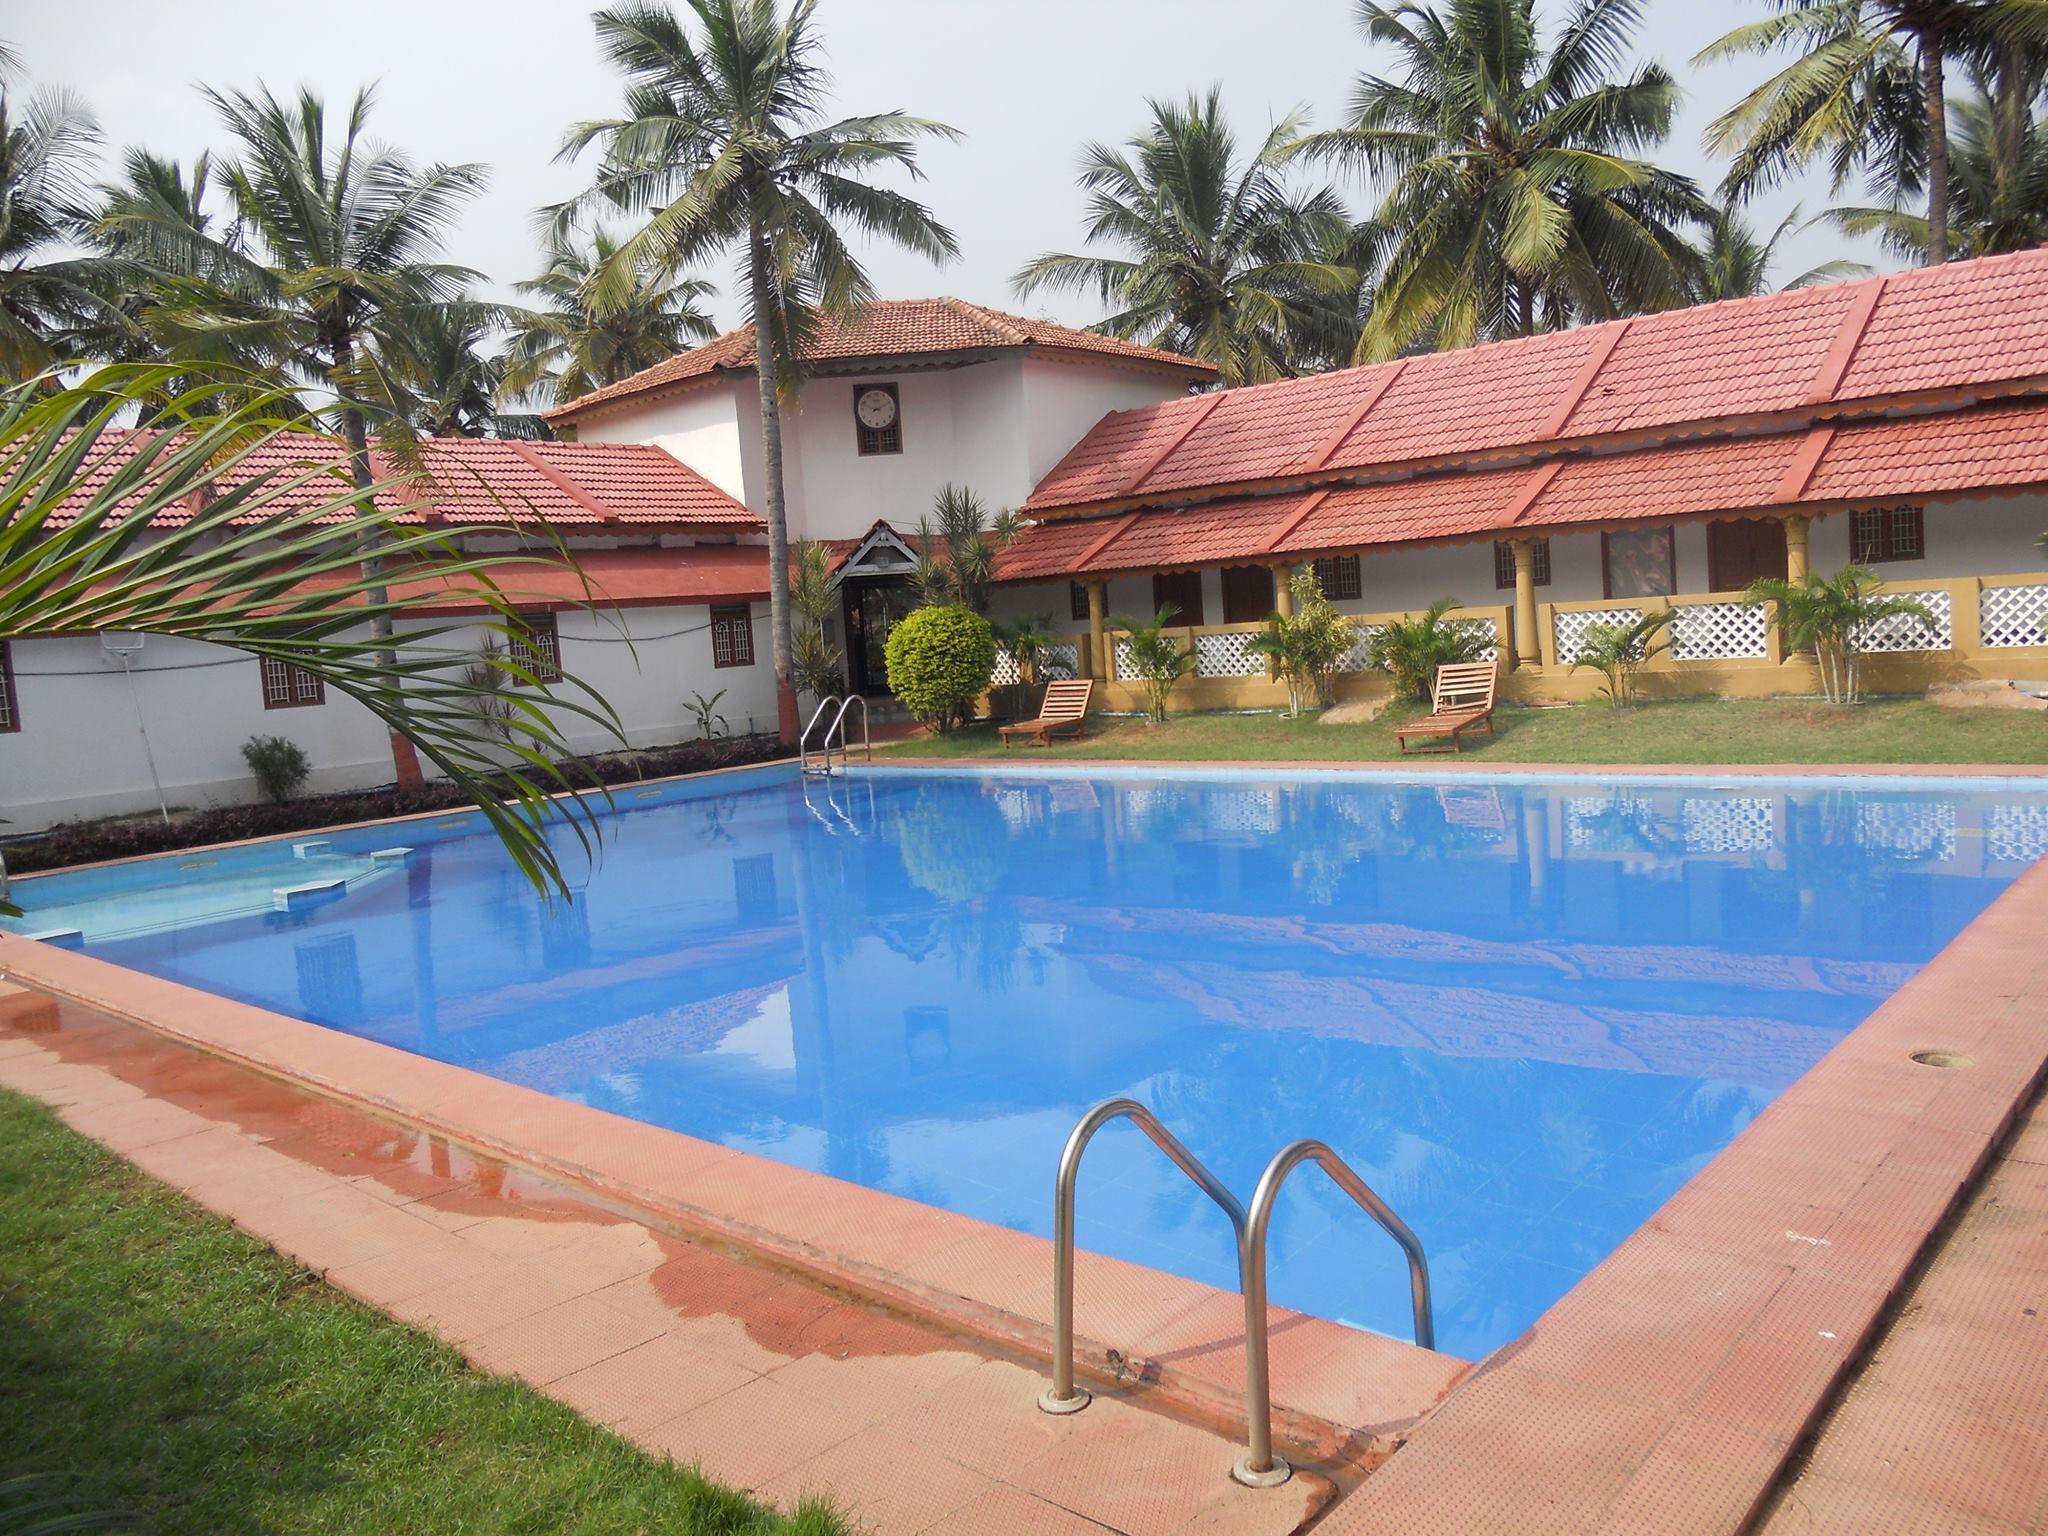 Kailash Resort Ecr Old Mahabalipuram Road East Coast Road Chennai India Great